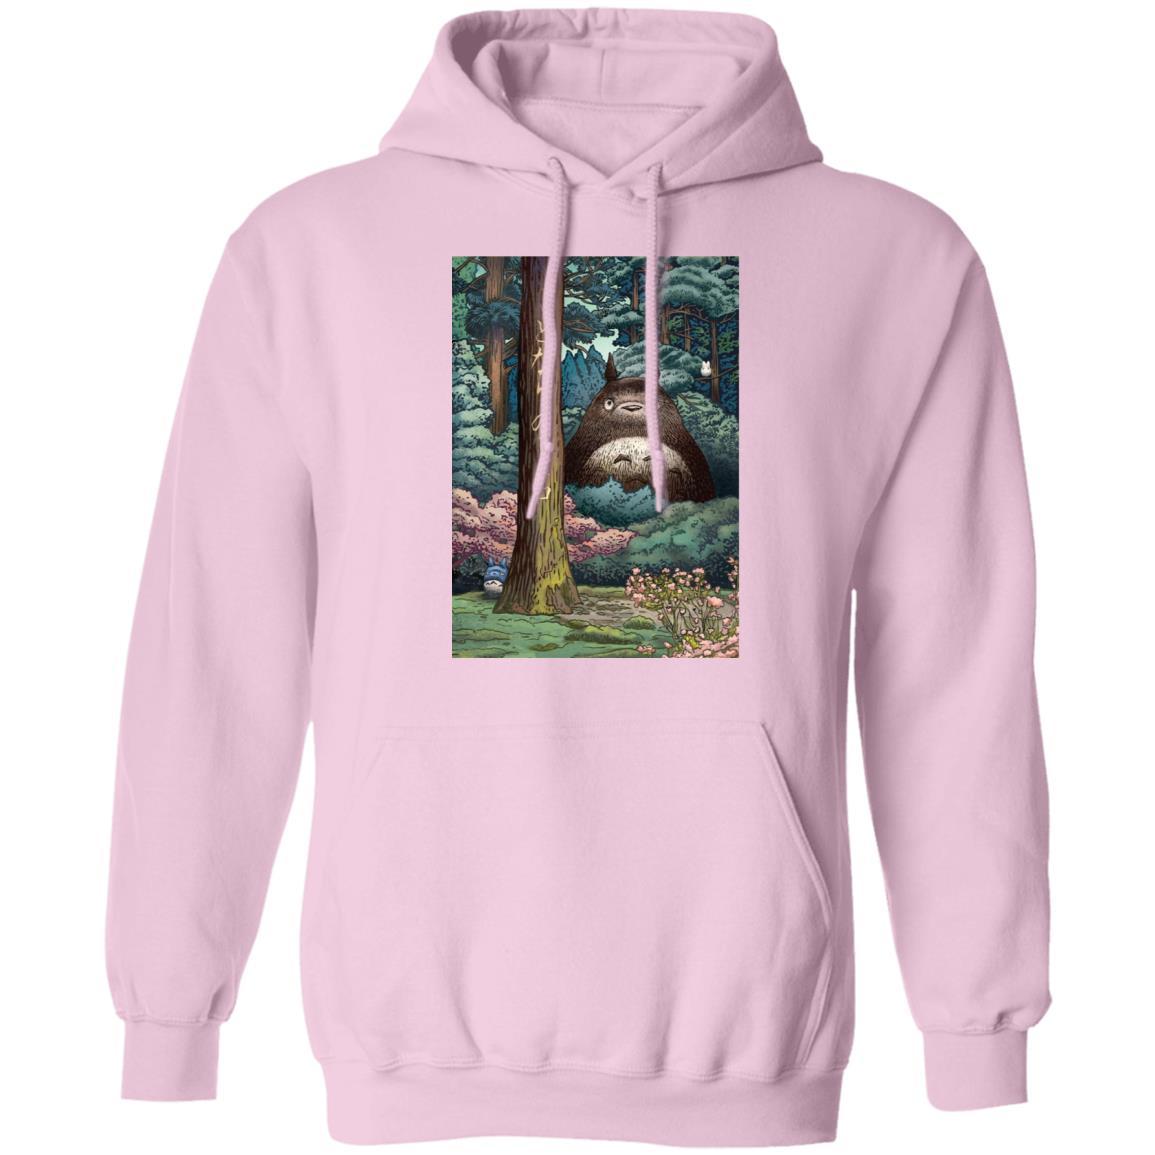 My Neighbor Totoro Forest Spirit Hoodie